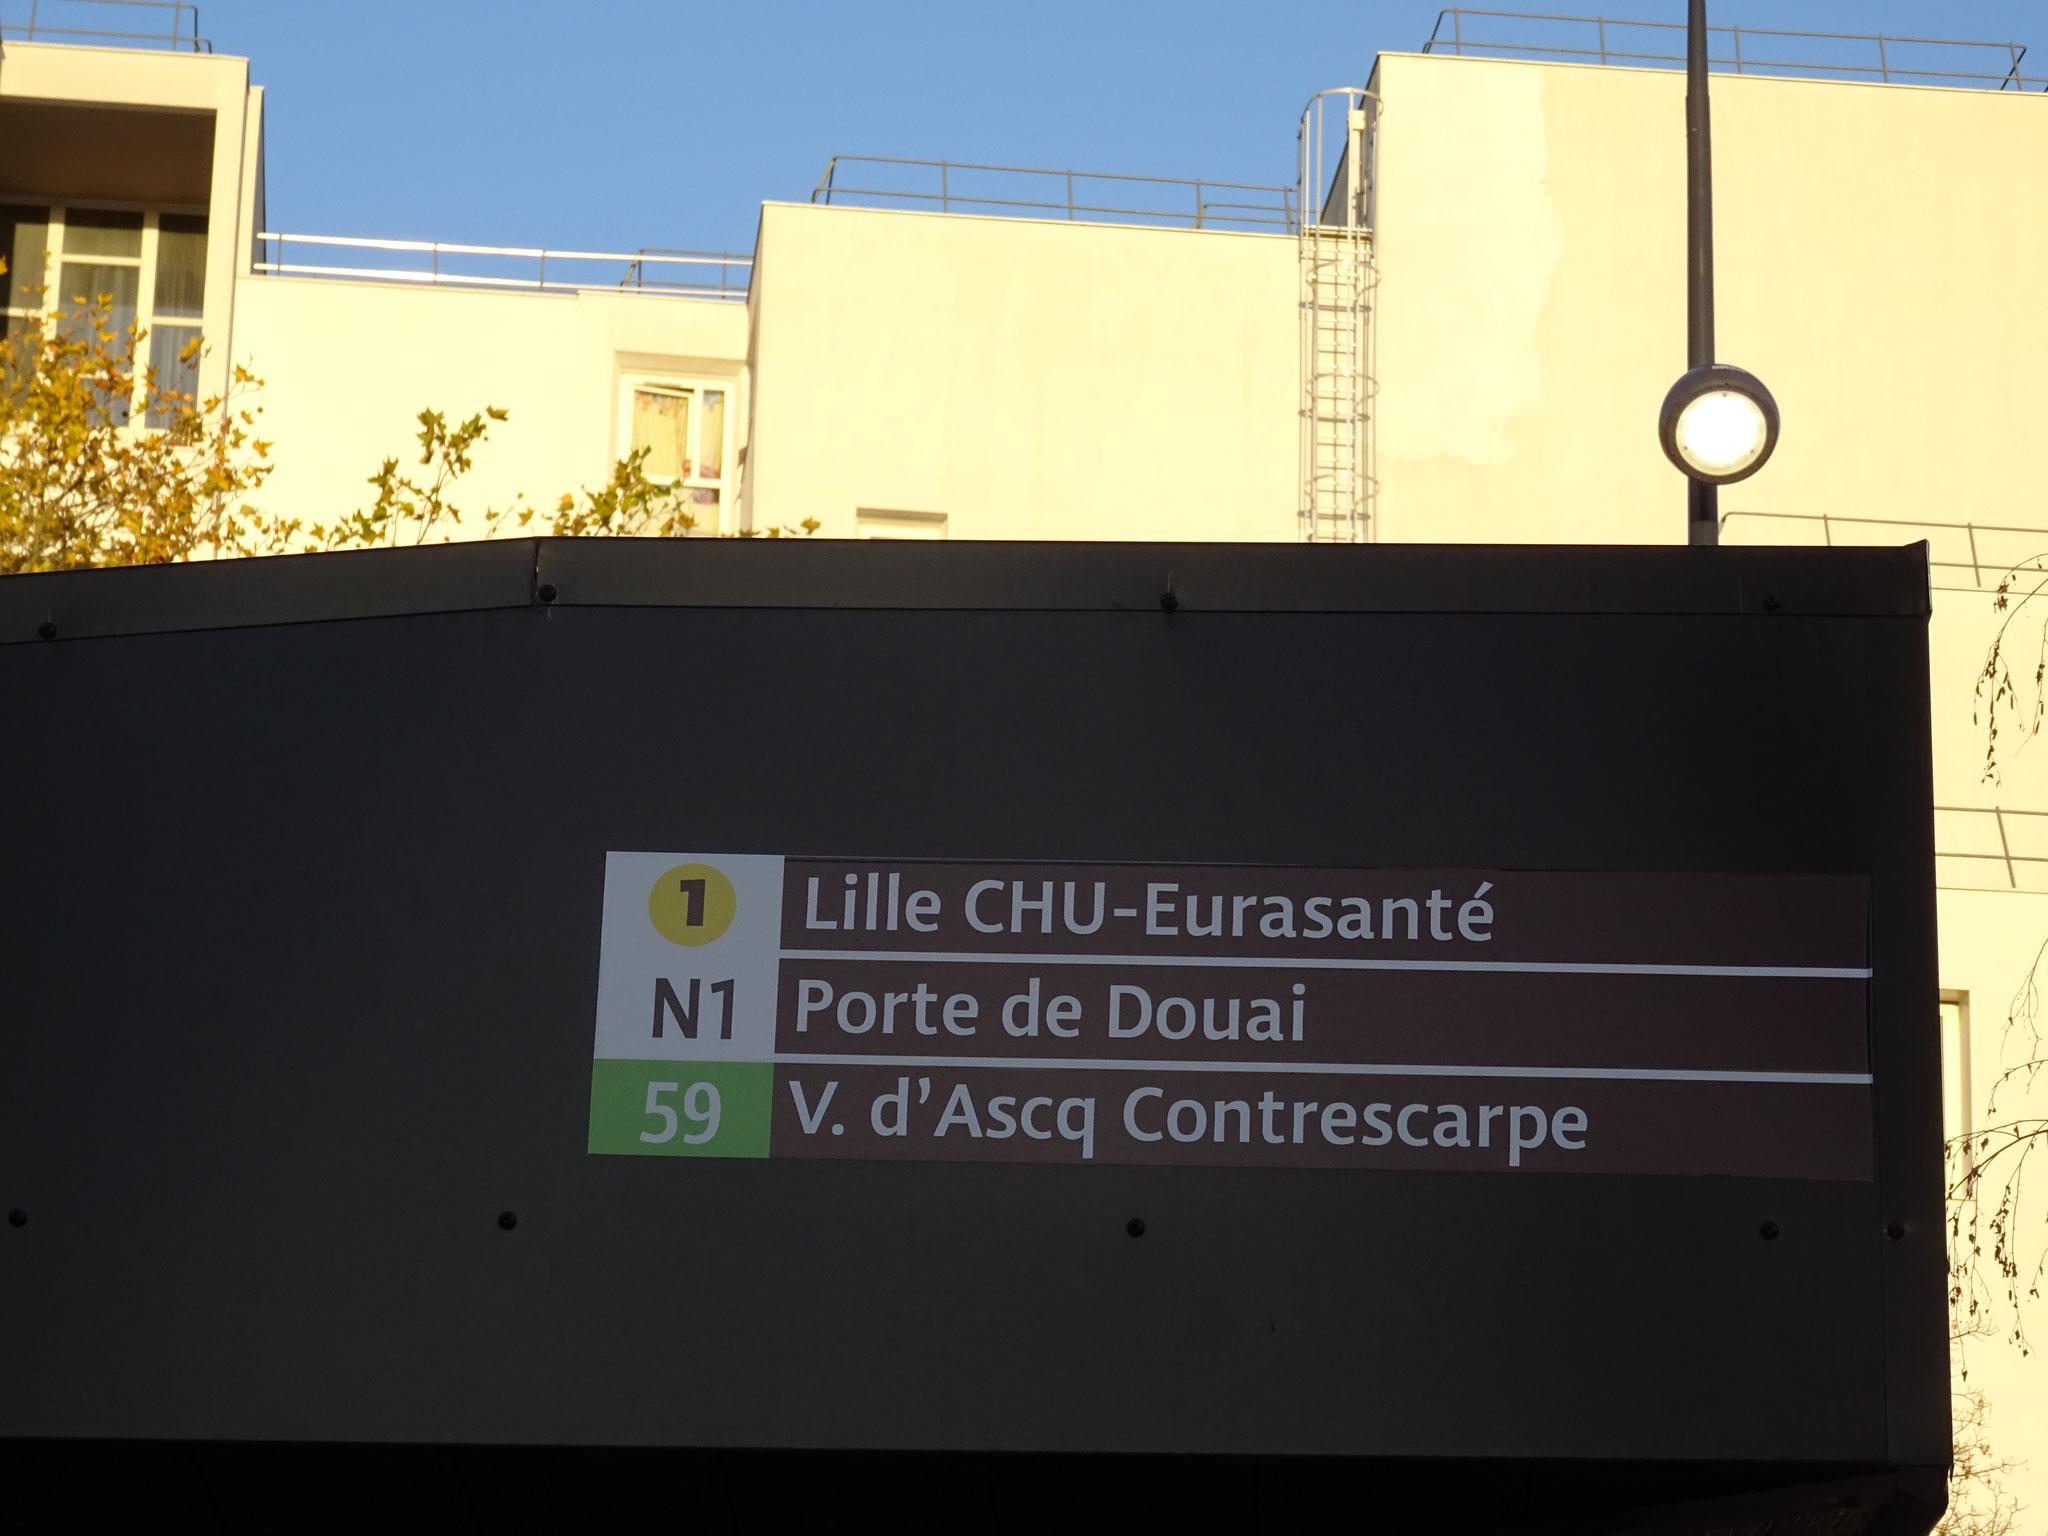 Arrêt des lignes N1 vers Lille et 59.